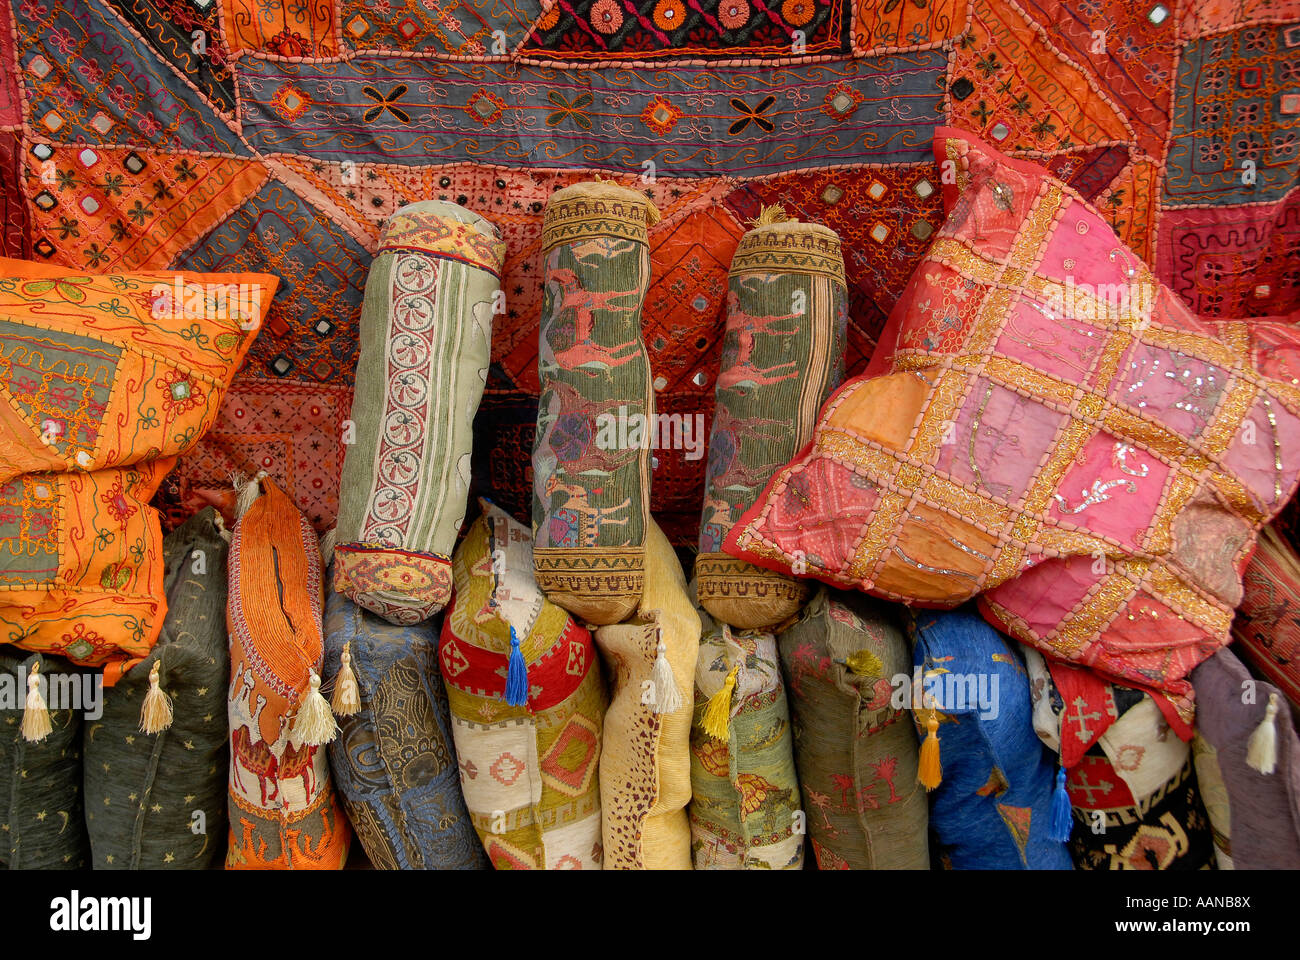 Wunderbar Türkei Färbung Bilder Fotos - Framing Malvorlagen ...